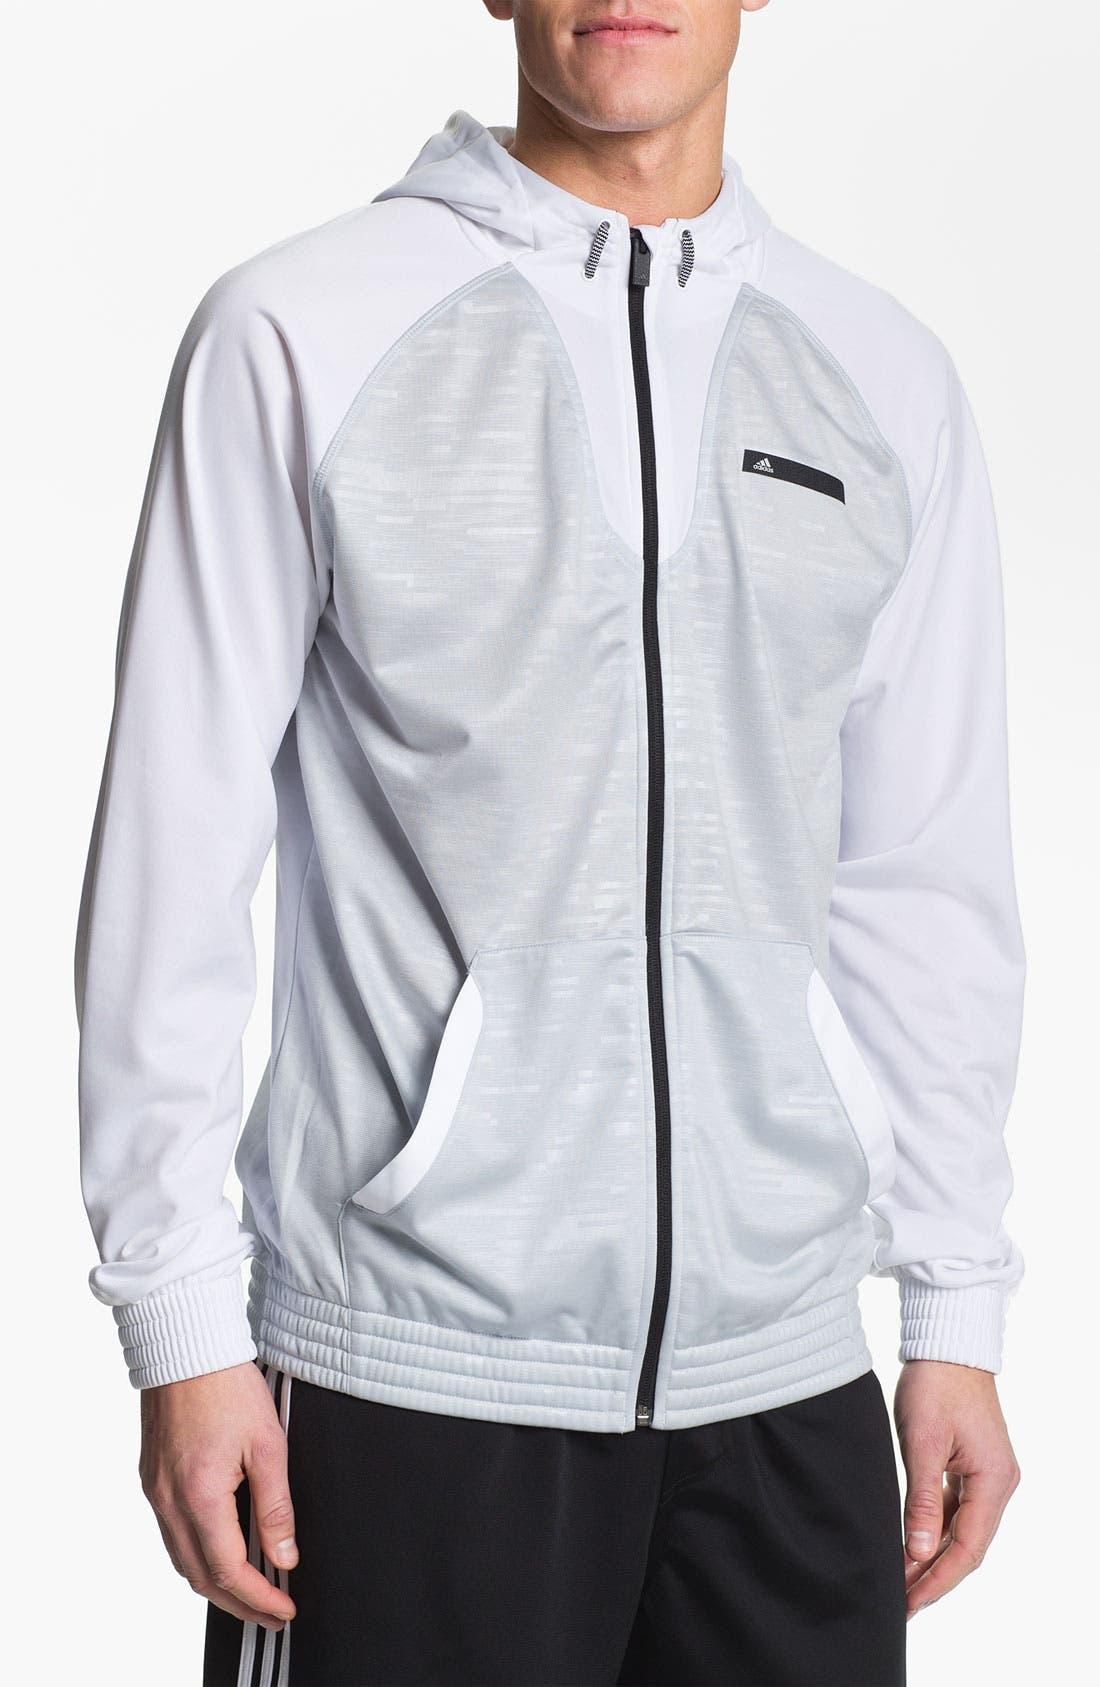 Alternate Image 1 Selected - adidas 'All World' Jacket